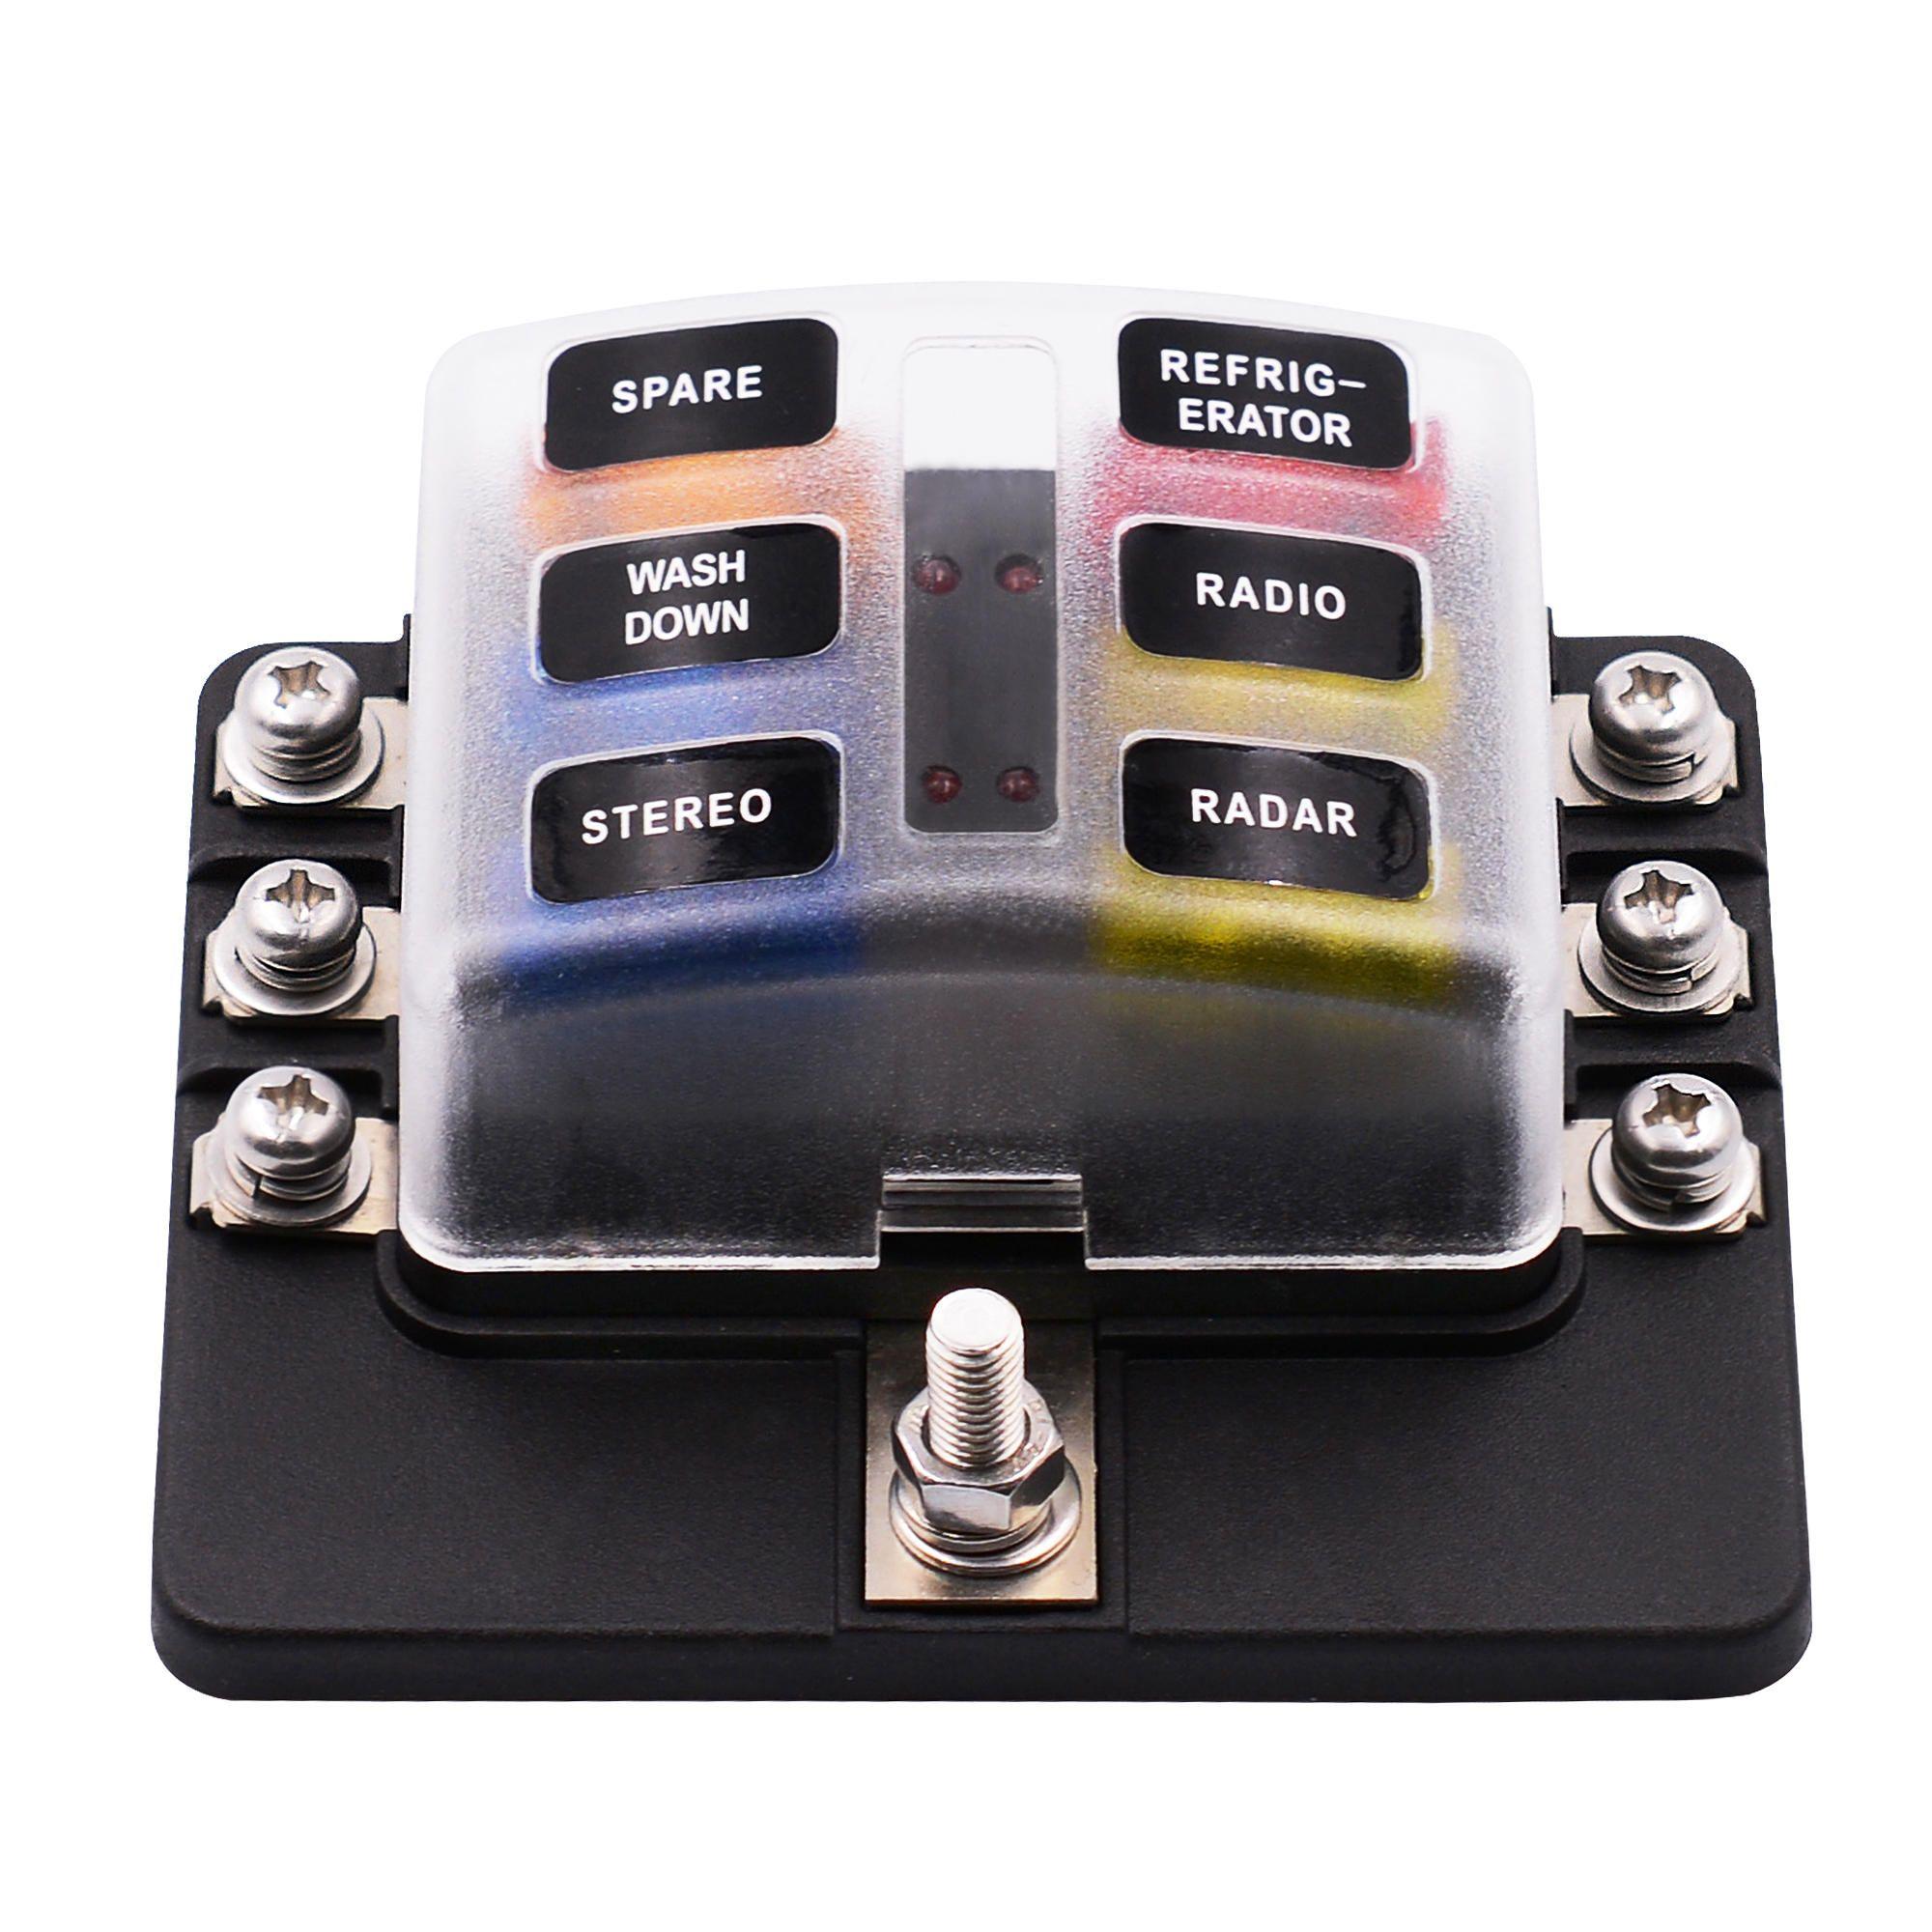 imars 6 way and 12 fuse box 12v 32v circuit standard blade block holder kit car caravan [ 2000 x 2000 Pixel ]